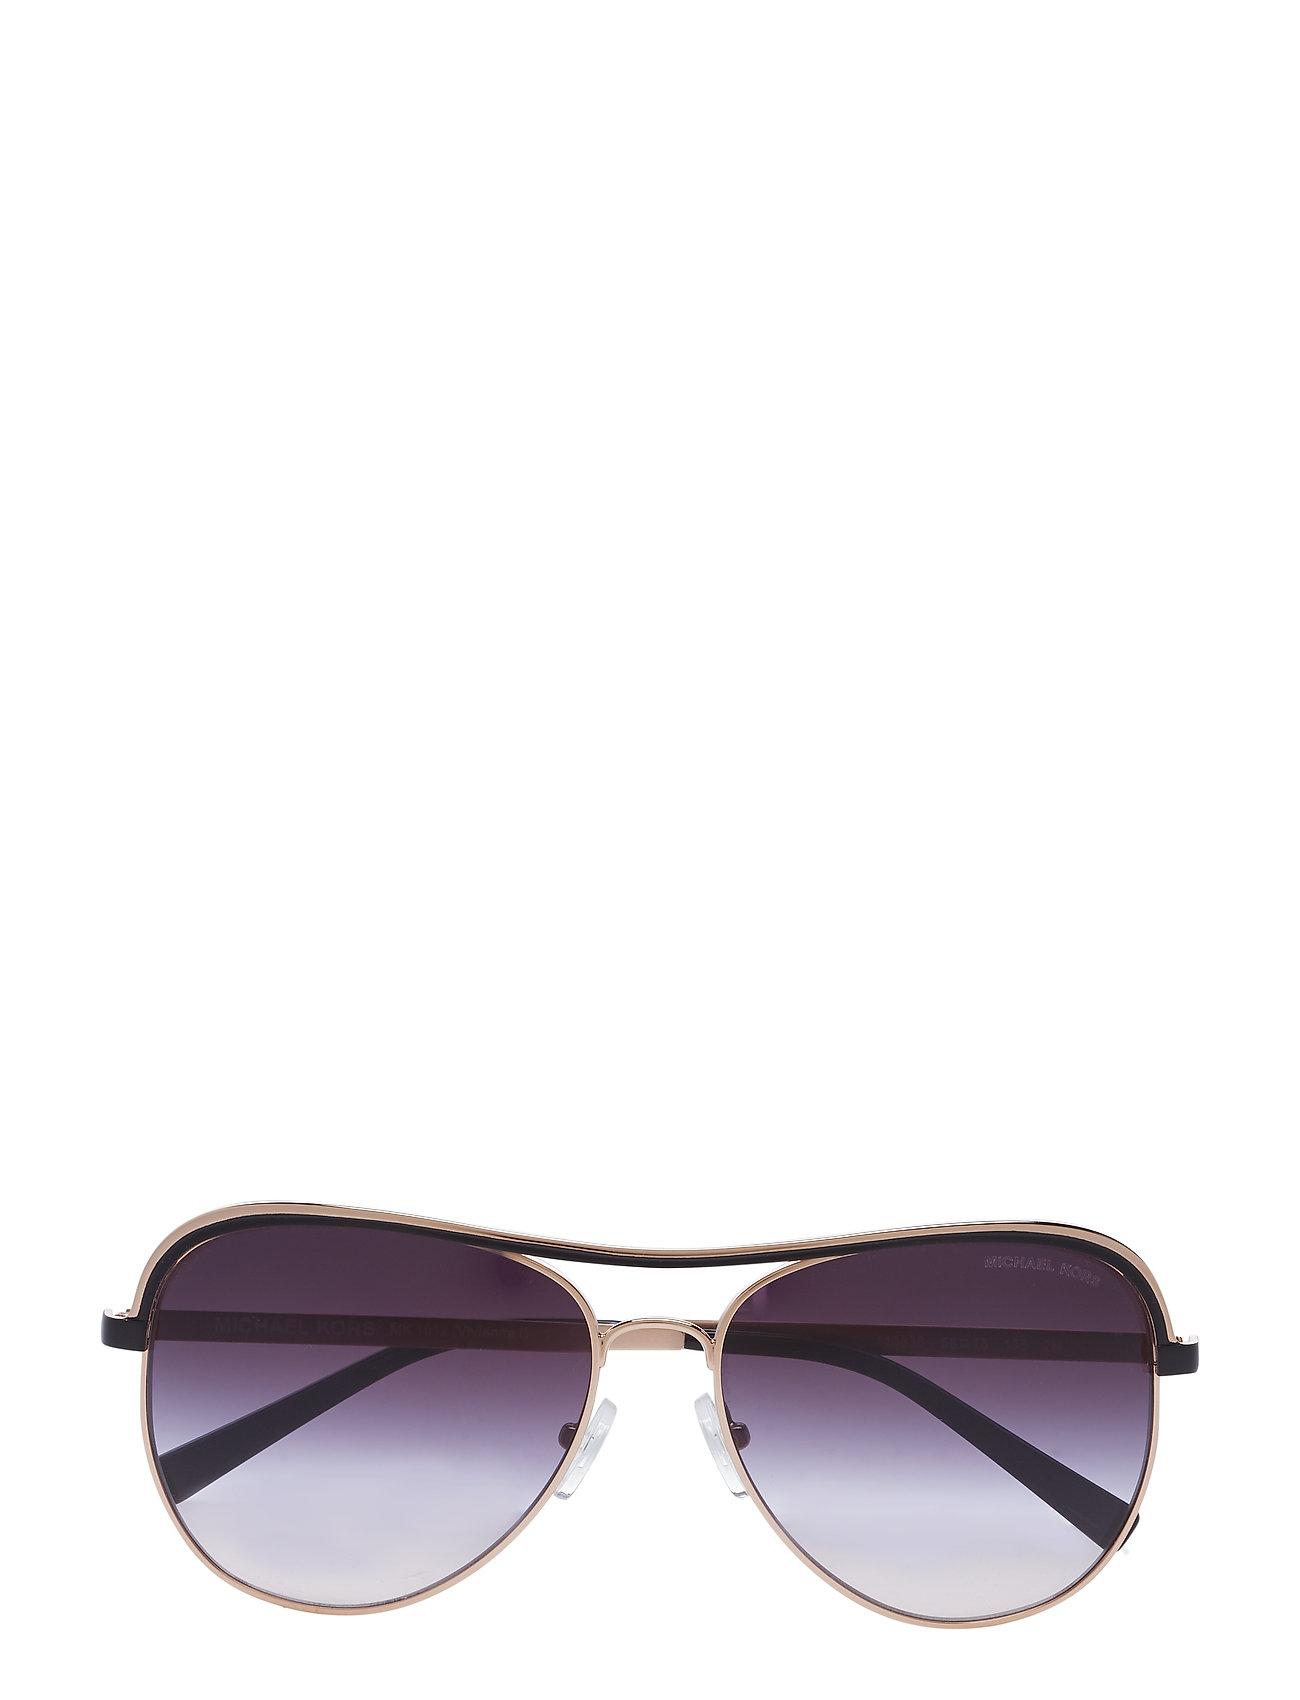 1a31d001e67 ROSE GOLD/BLACK Michael Kors Vivianna I aviator solbriller for dame ...